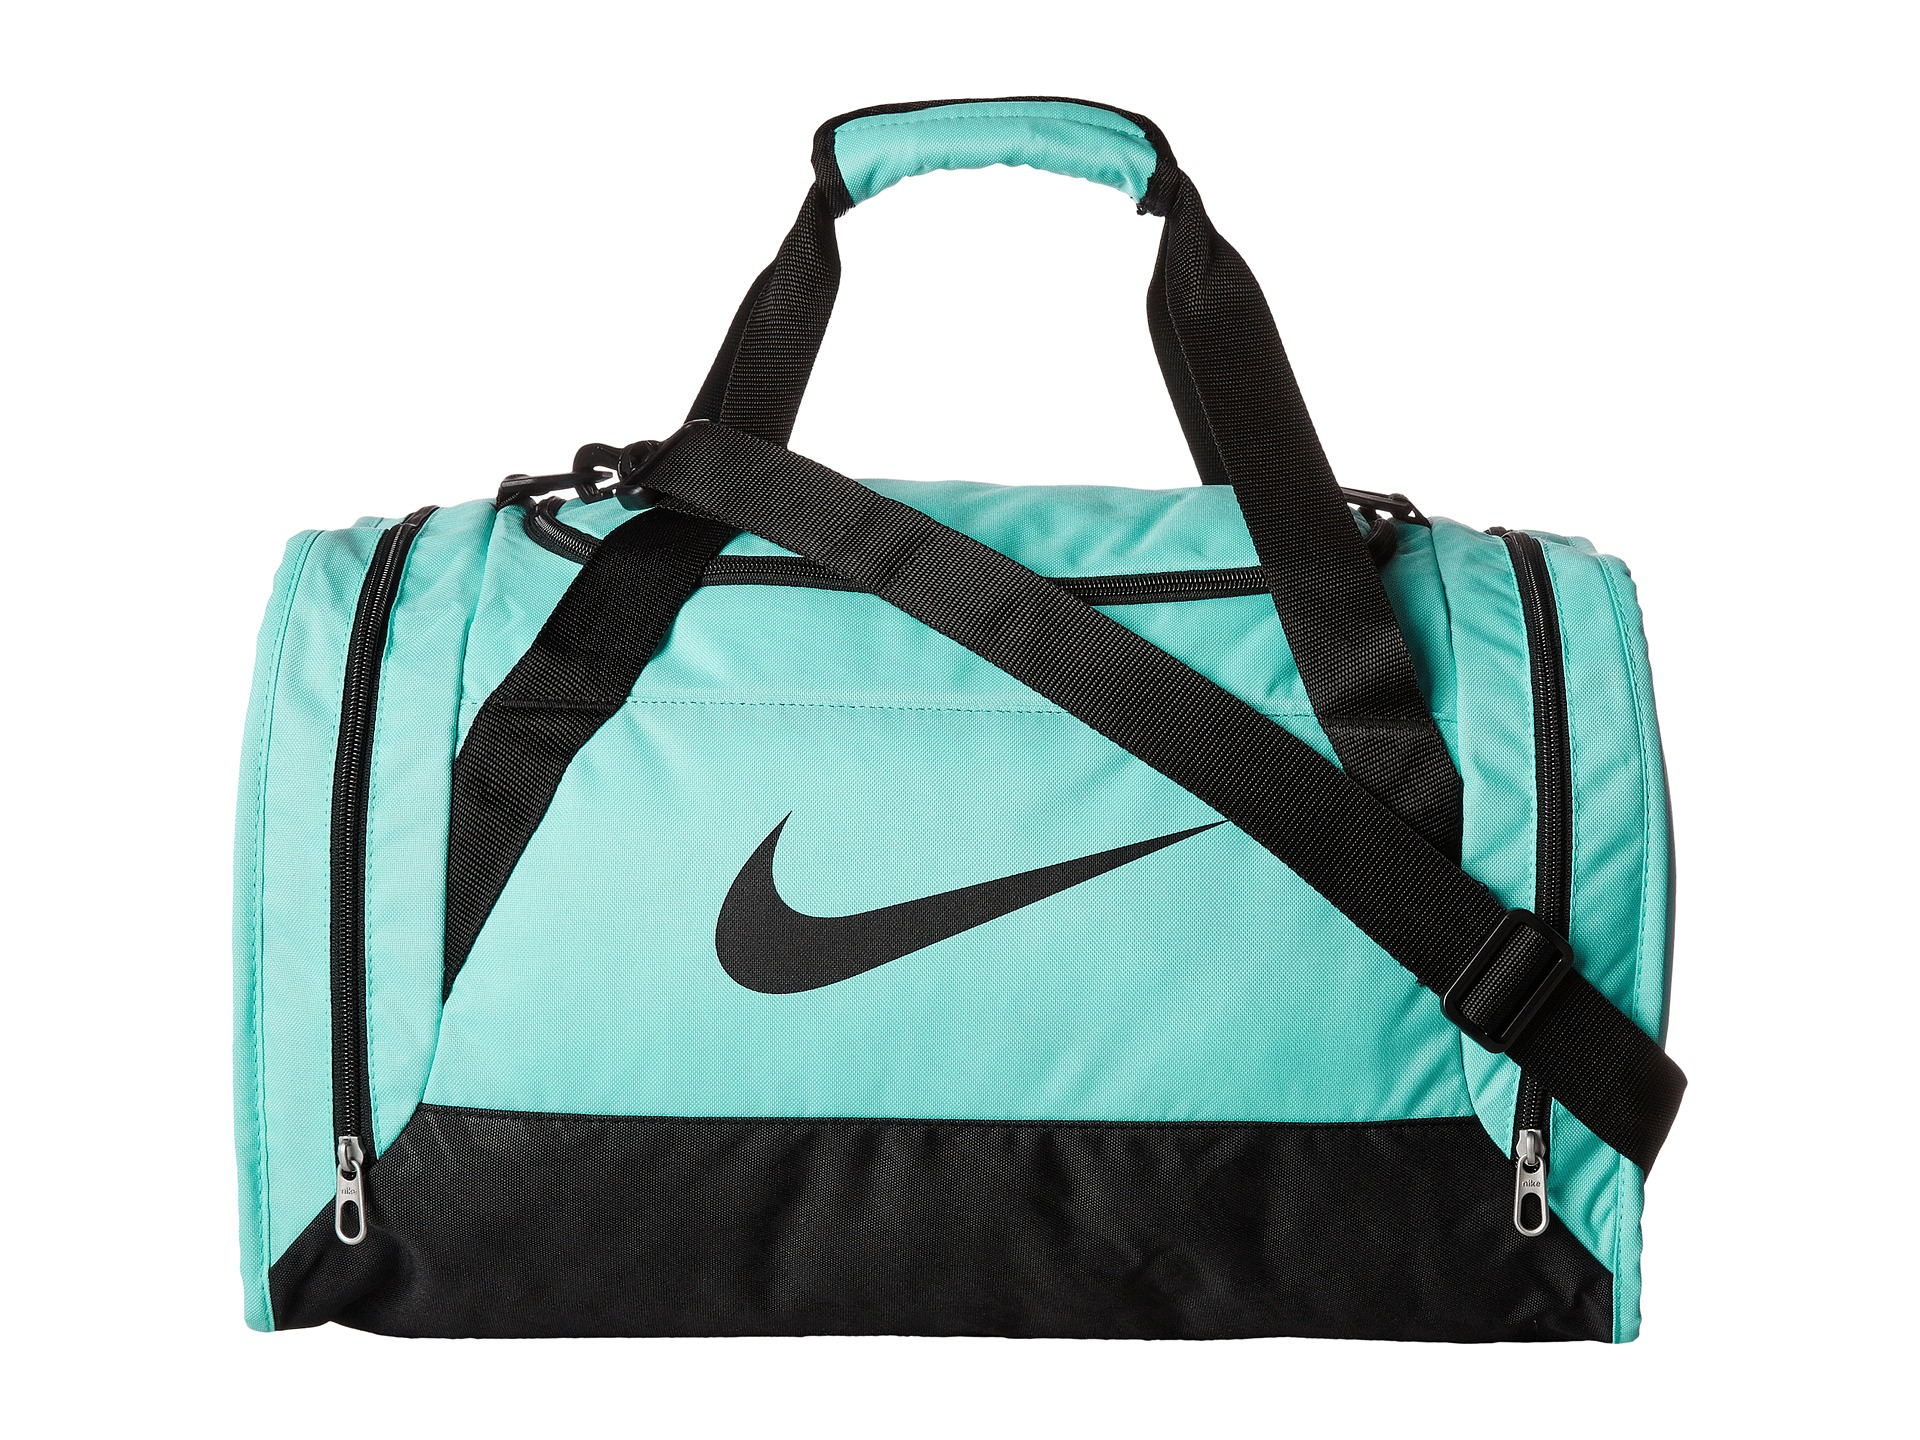 Lyst - Nike Brasilia 6 Duffel Small in Blue 40b23866e0e20